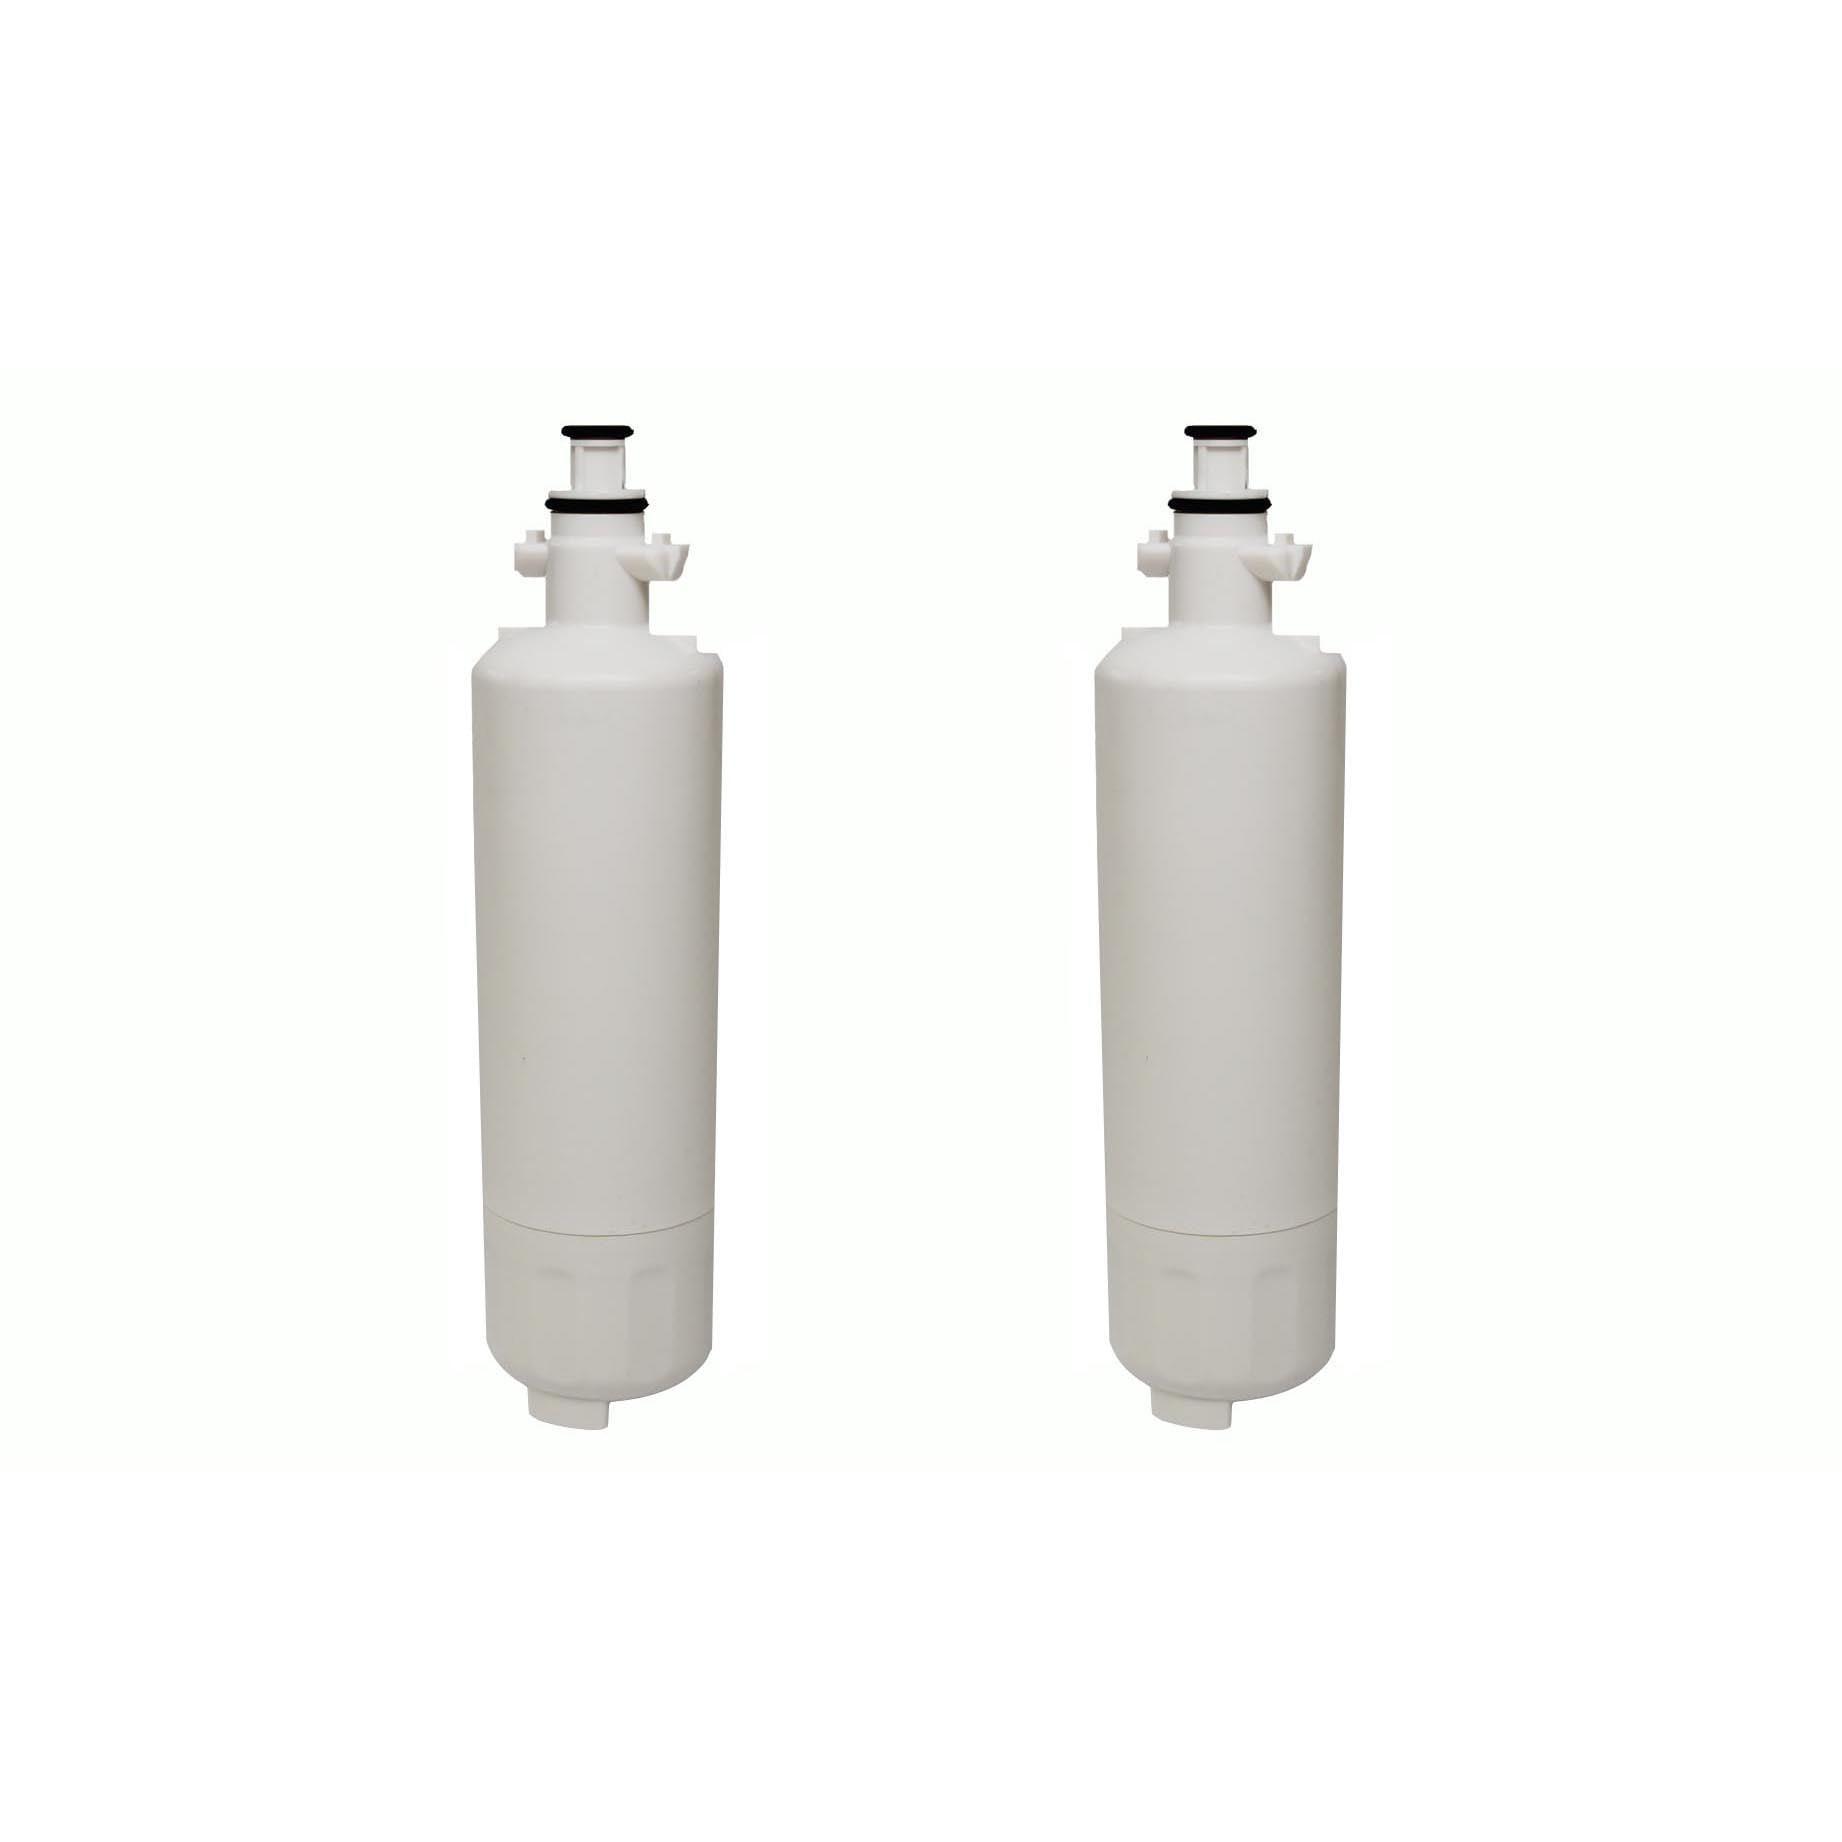 Crucial 2 LG LT700P (RFC1200A) Refrigerator Water Purifie...